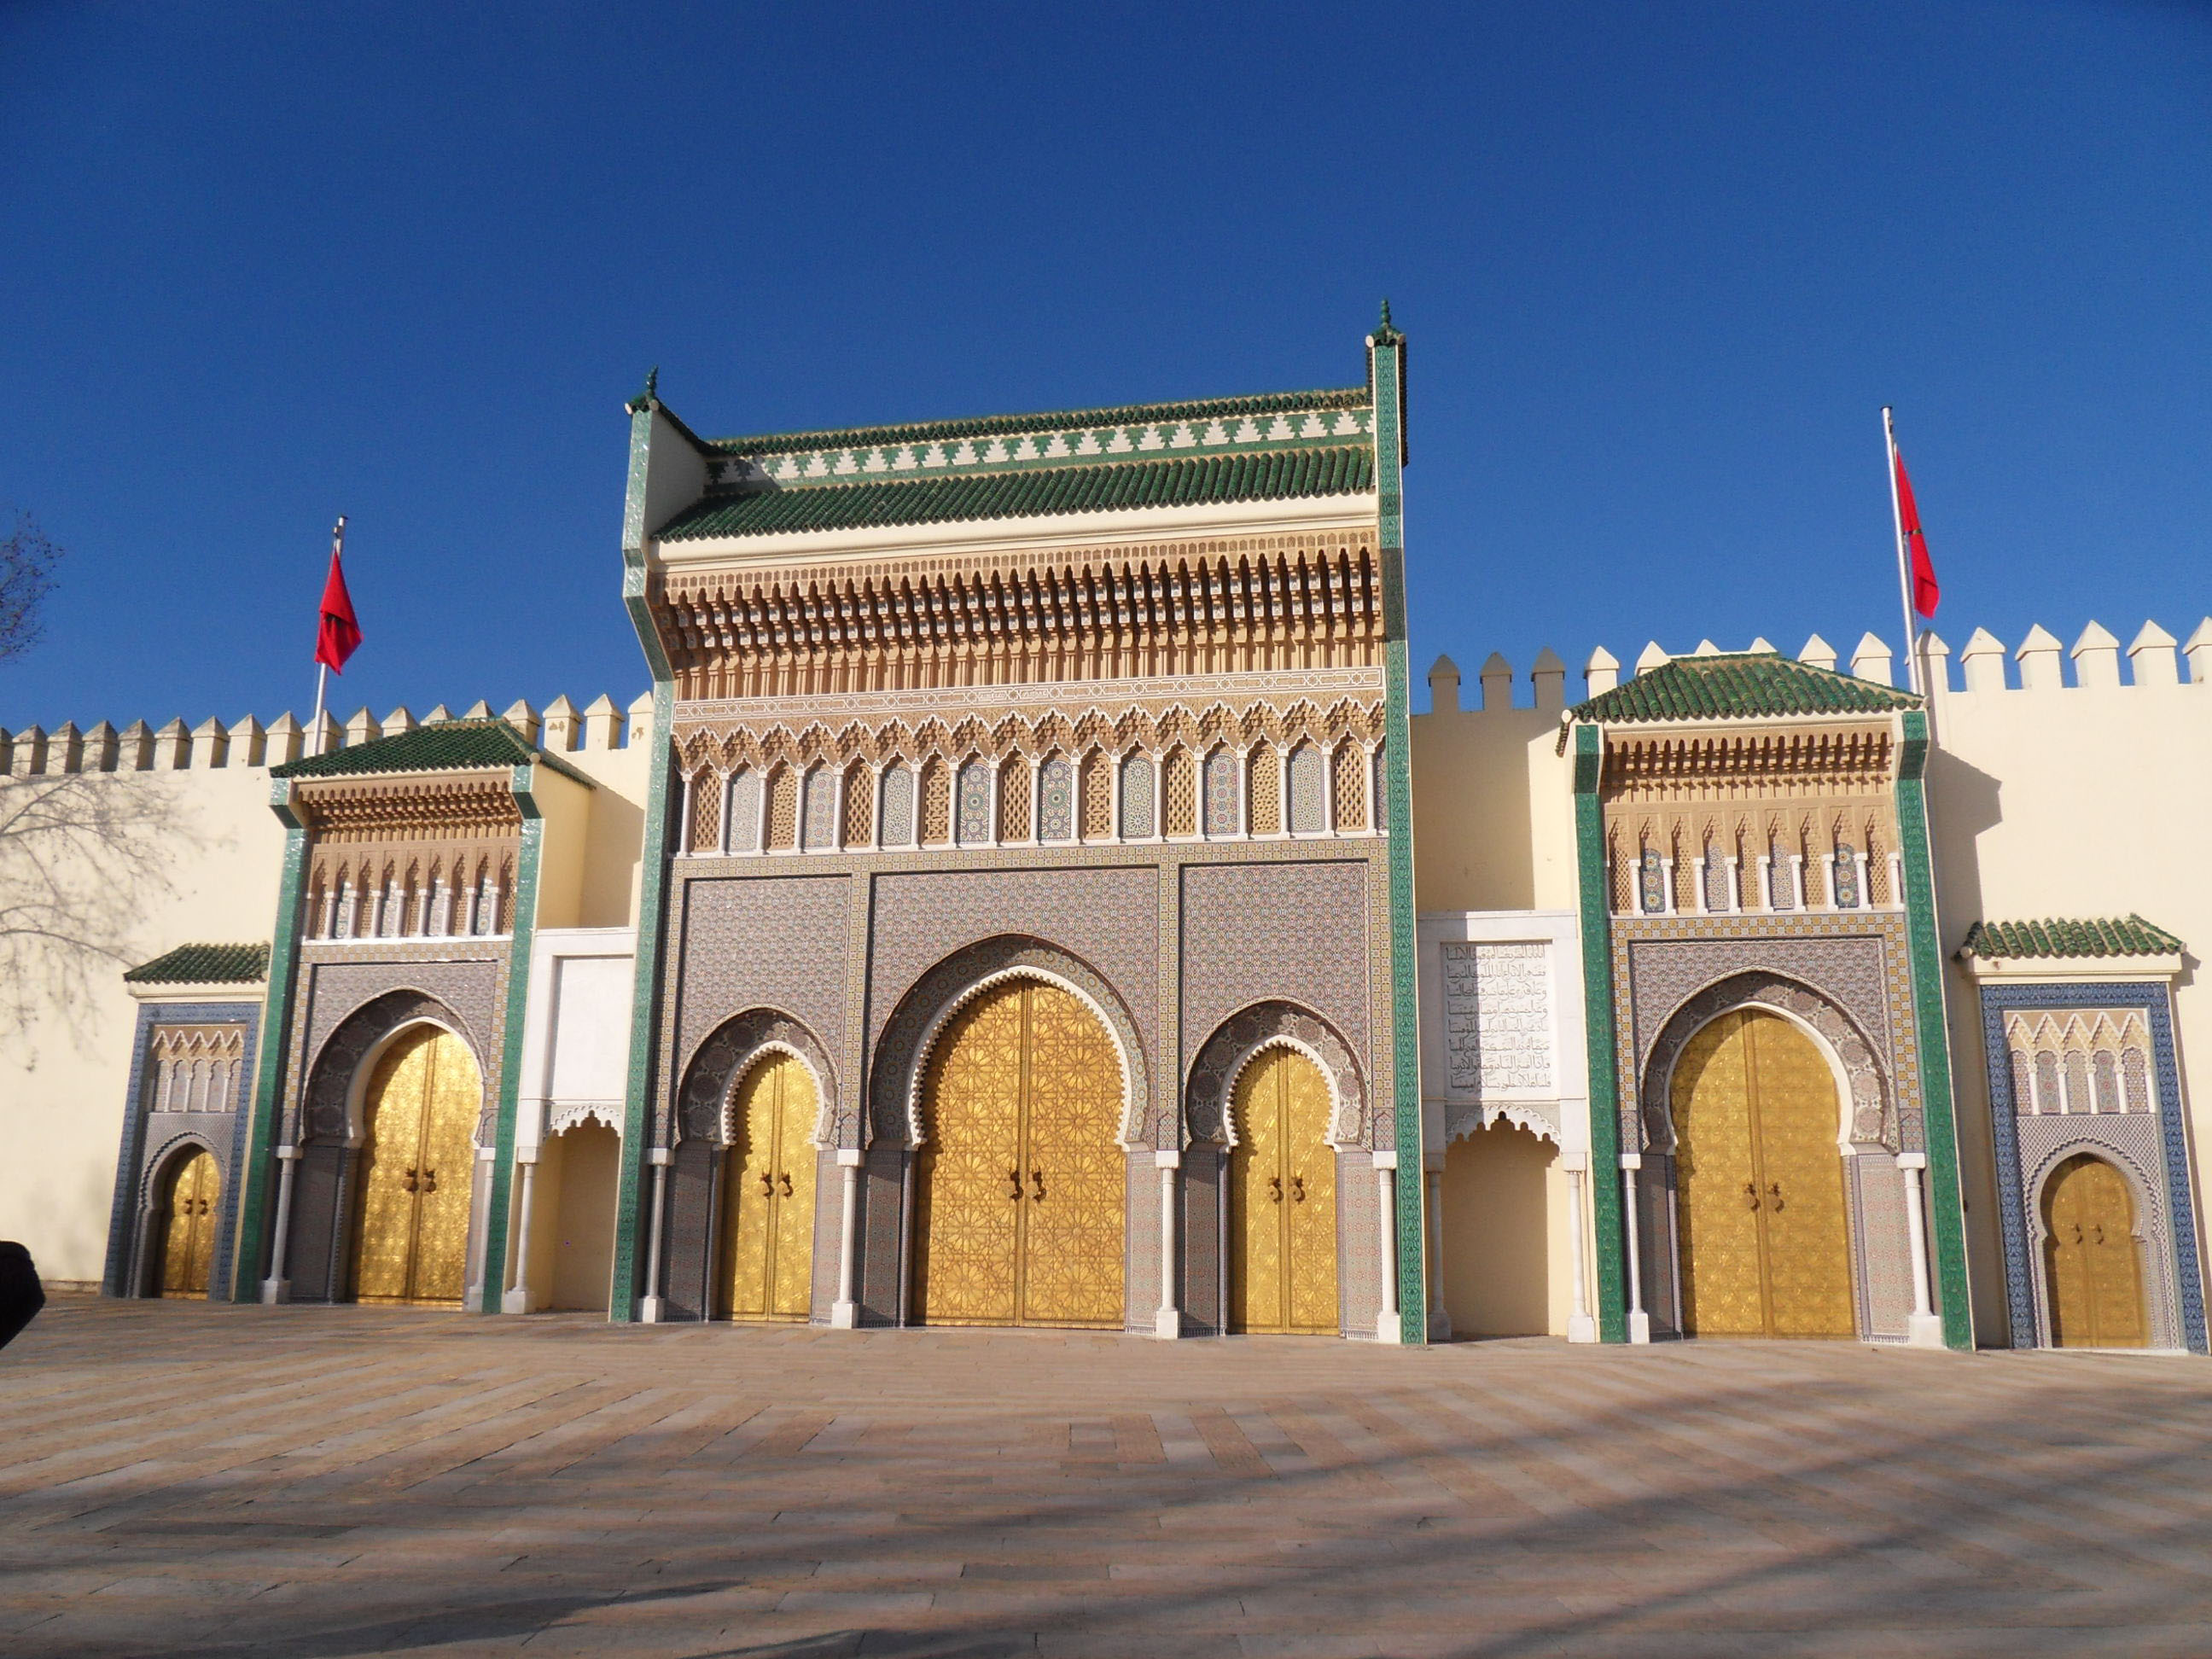 Marokko: Fes